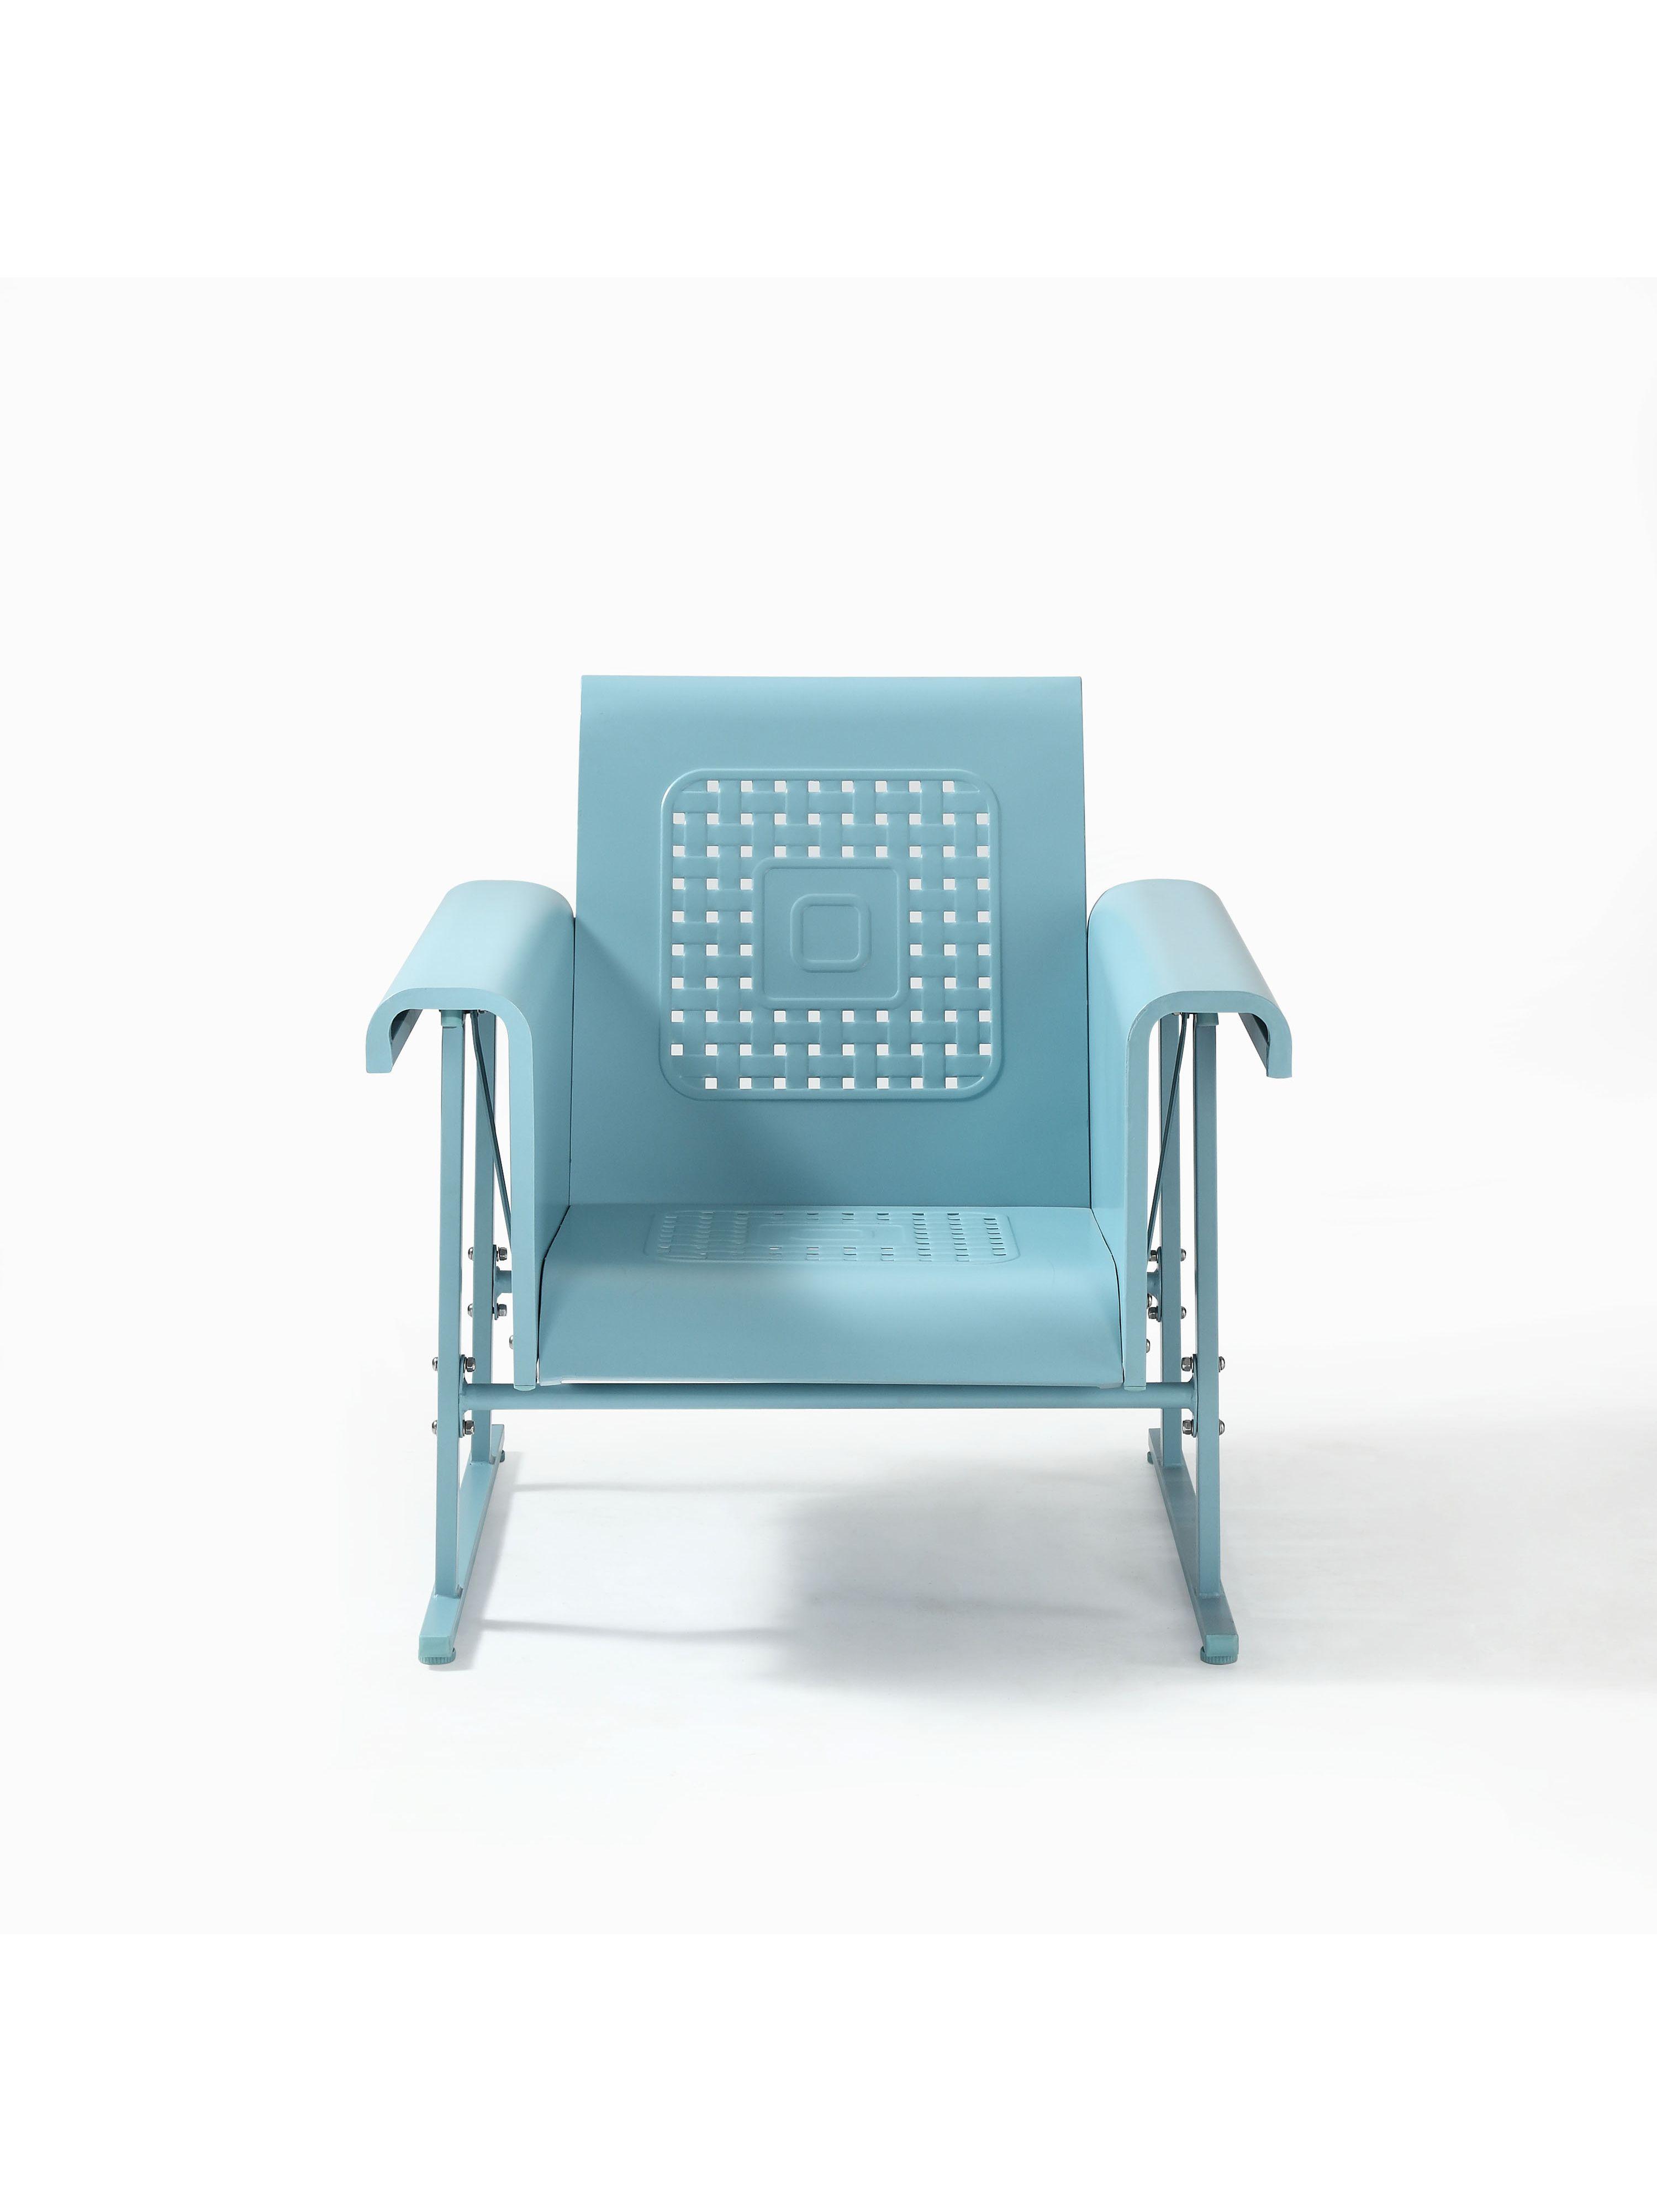 Glider Chair Veranda Glider Chair Gardeners Com Glider Chair Retro Chair Furniture